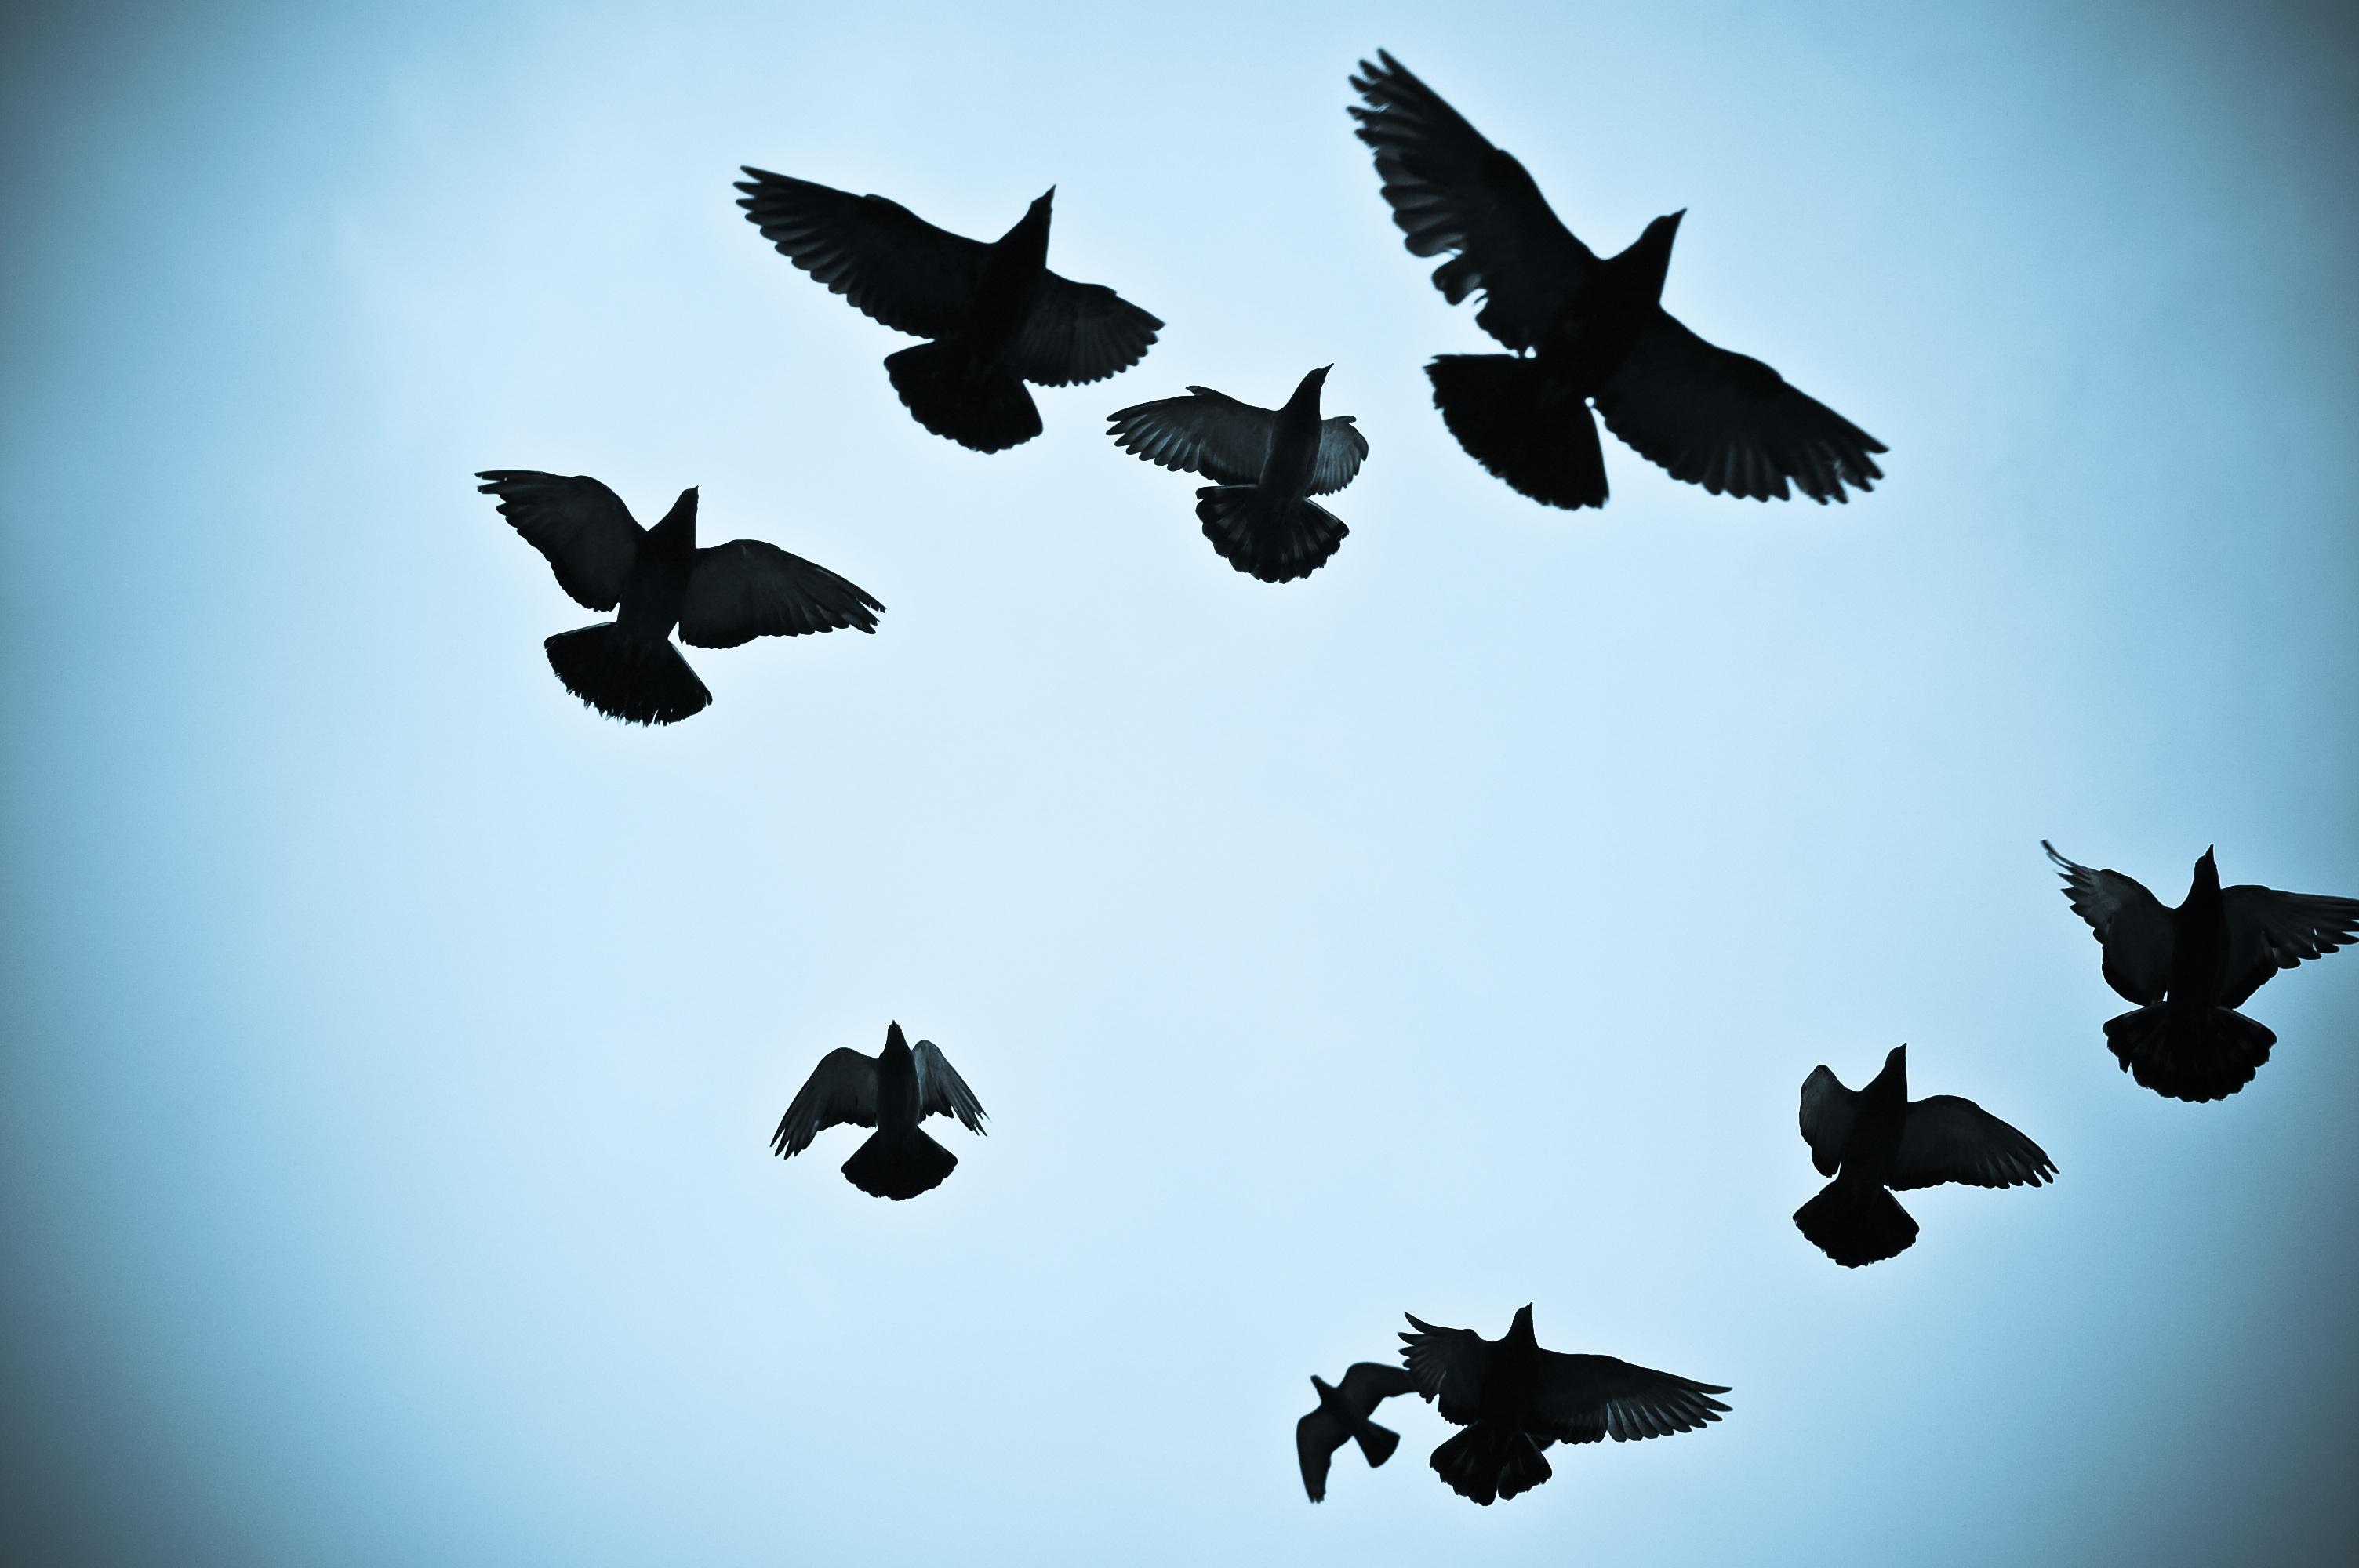 Free Images : wing, flower, airplane, flight, black, birds ...